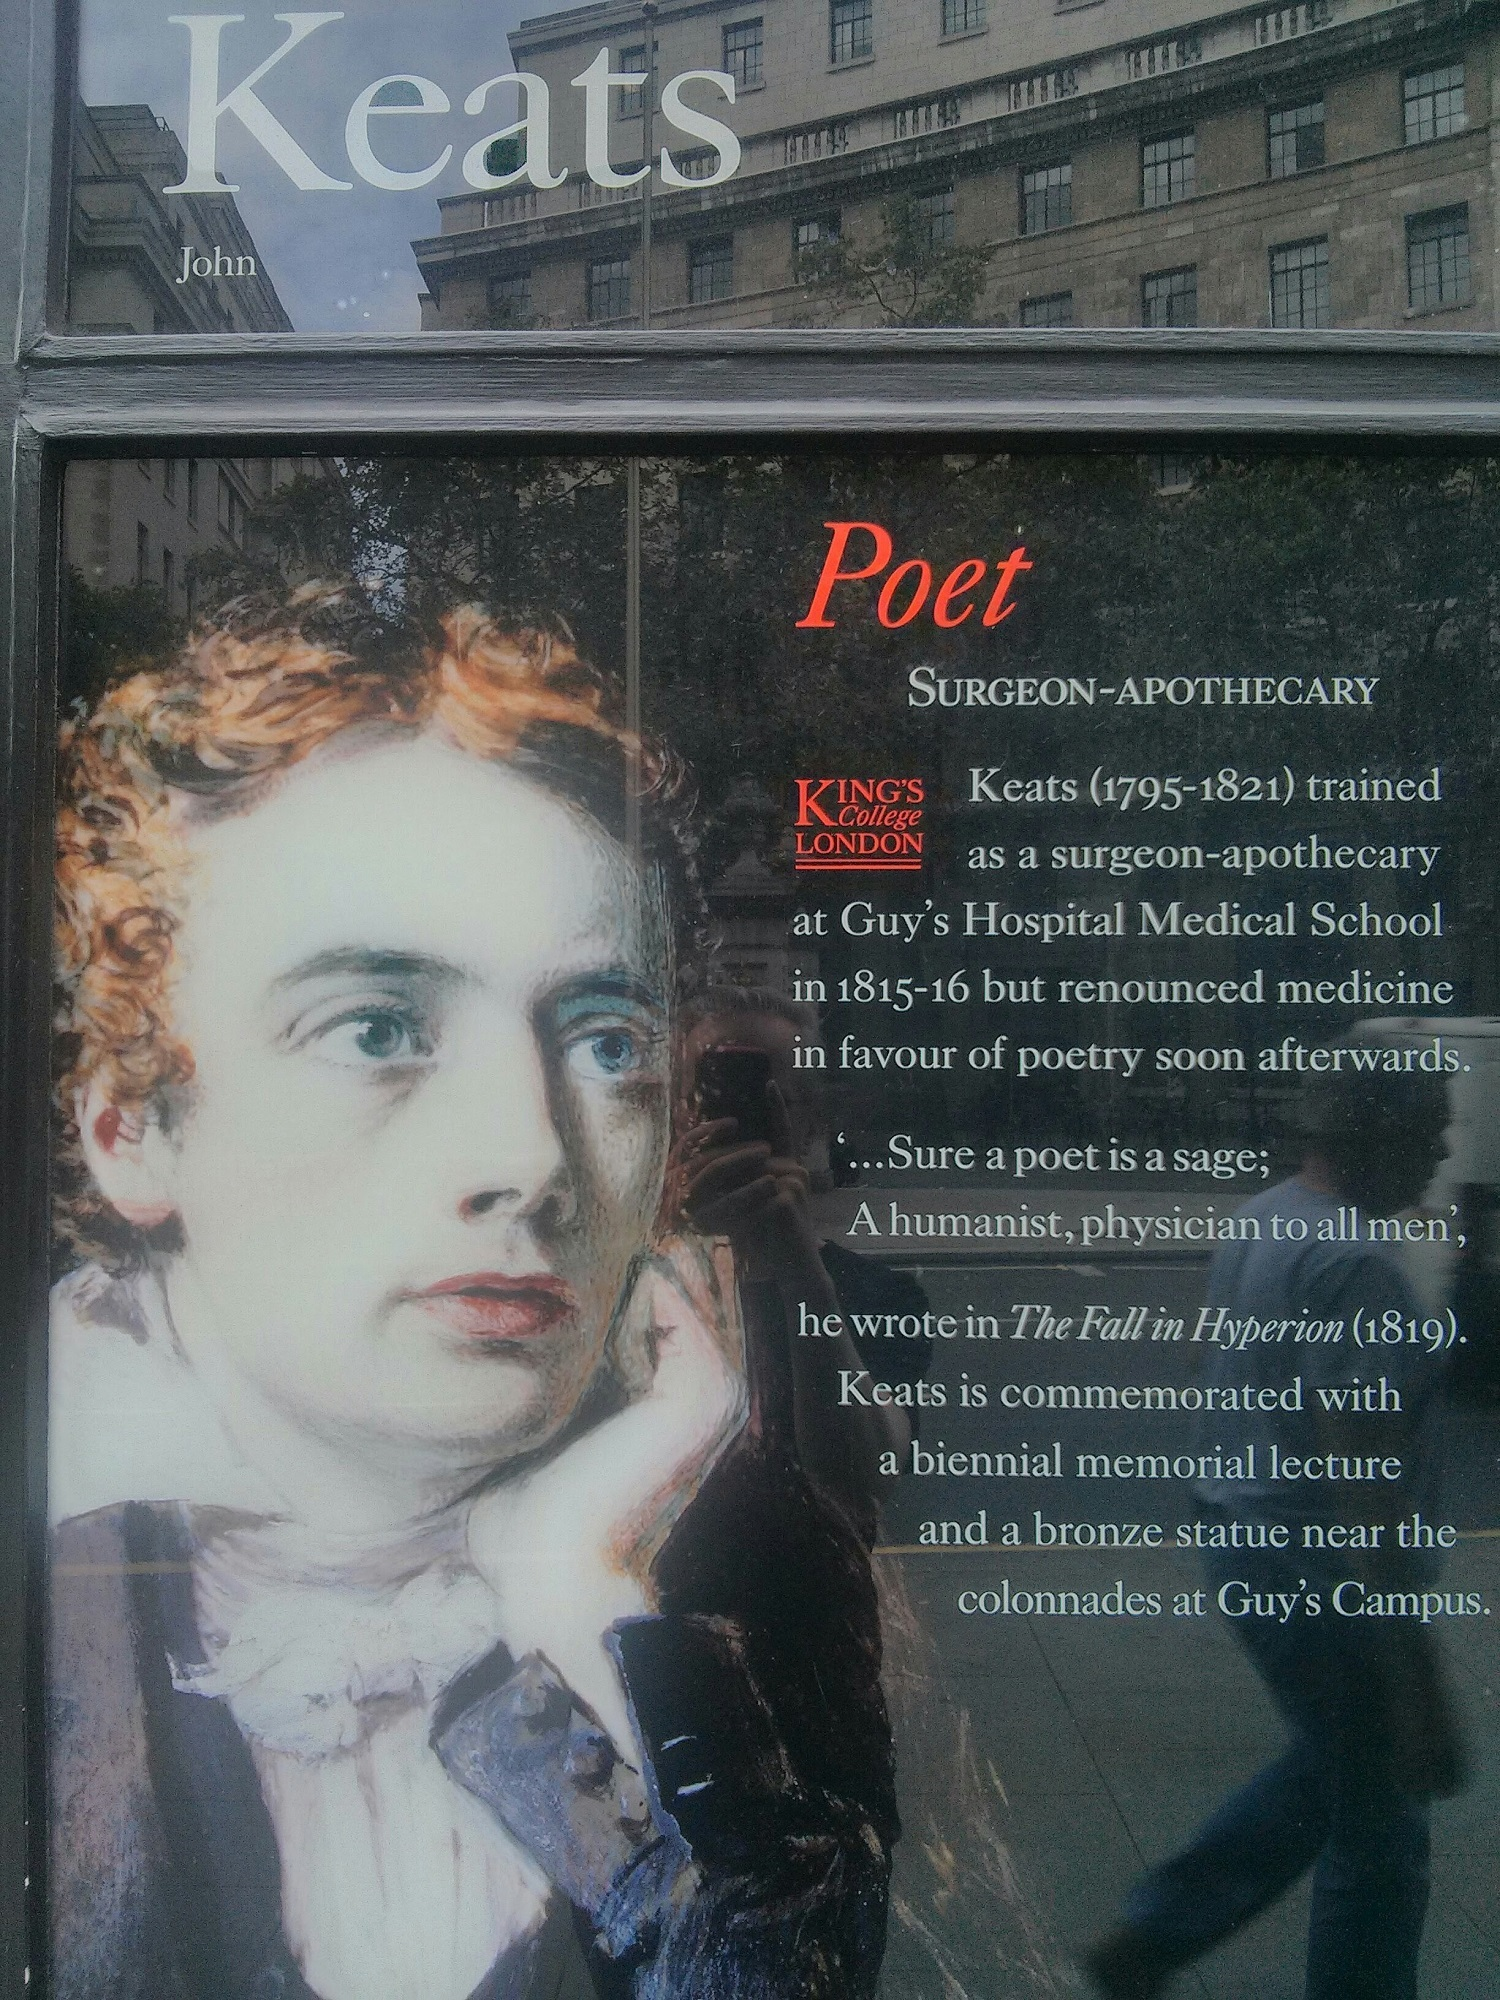 Keats: alumnus of King's college and my favourite romantic poet